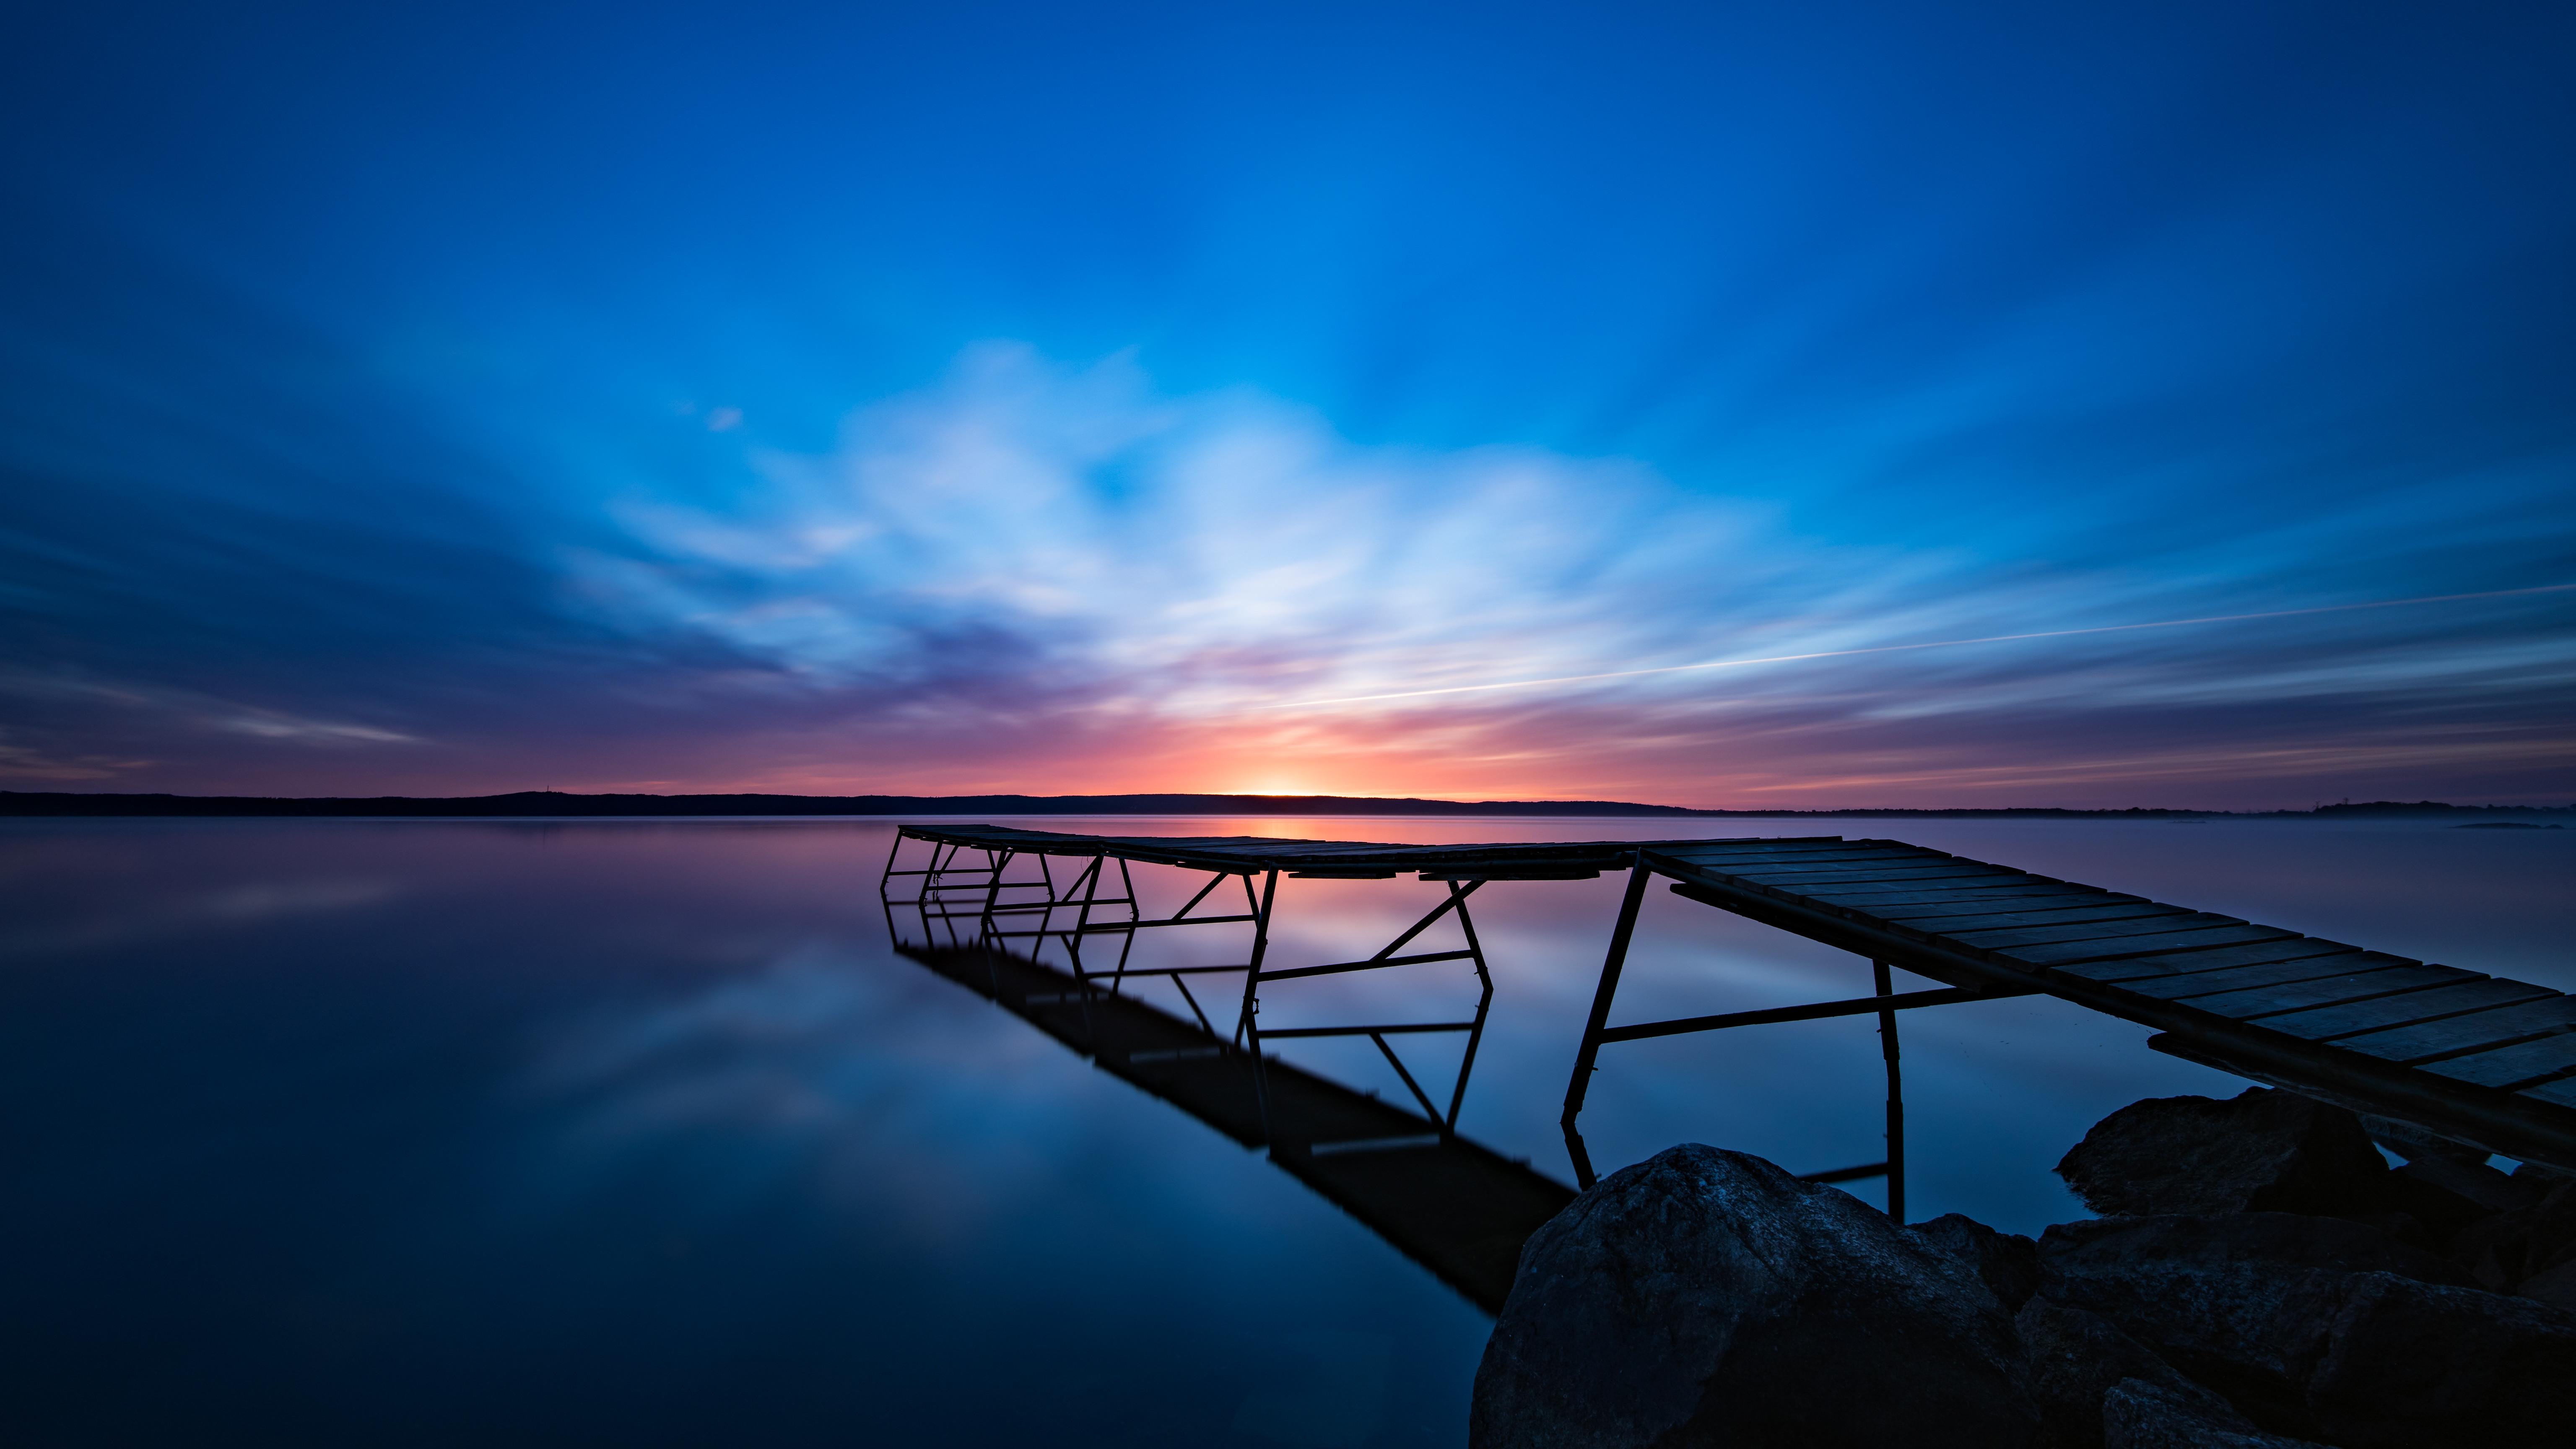 sunrise along deck 1574937857 - Sunrise Along Deck -